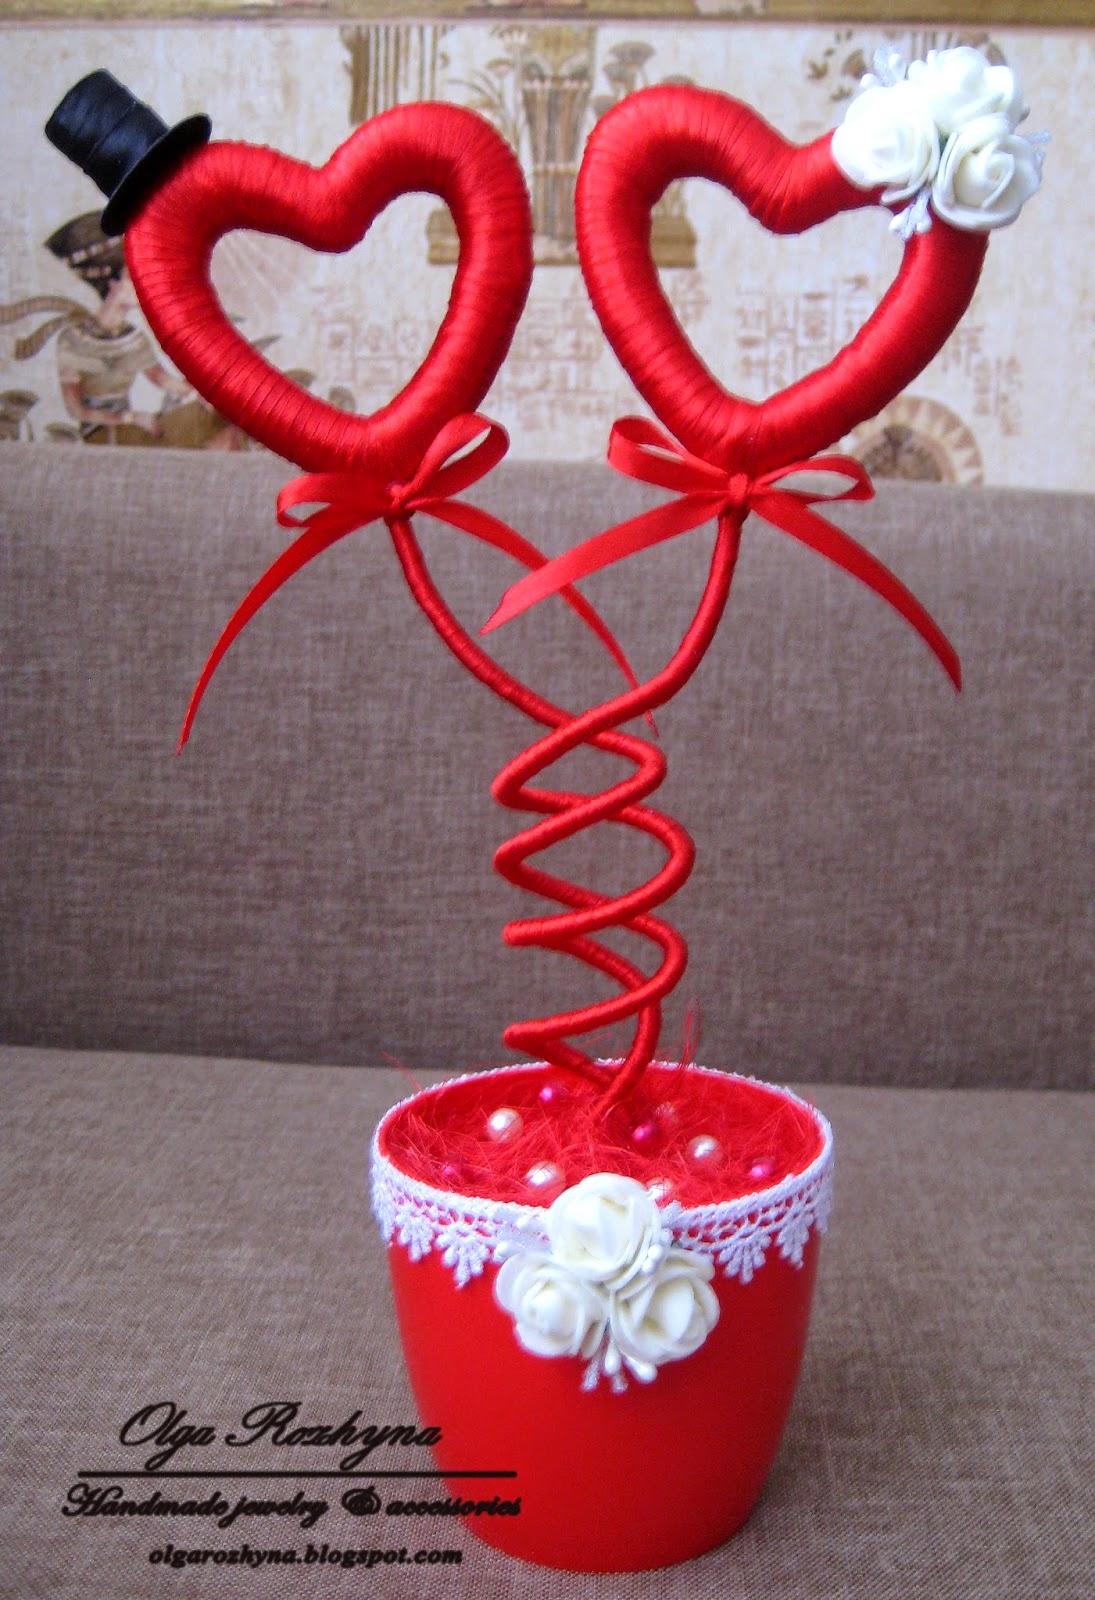 Топиарий к дню святого валентина своими руками фото